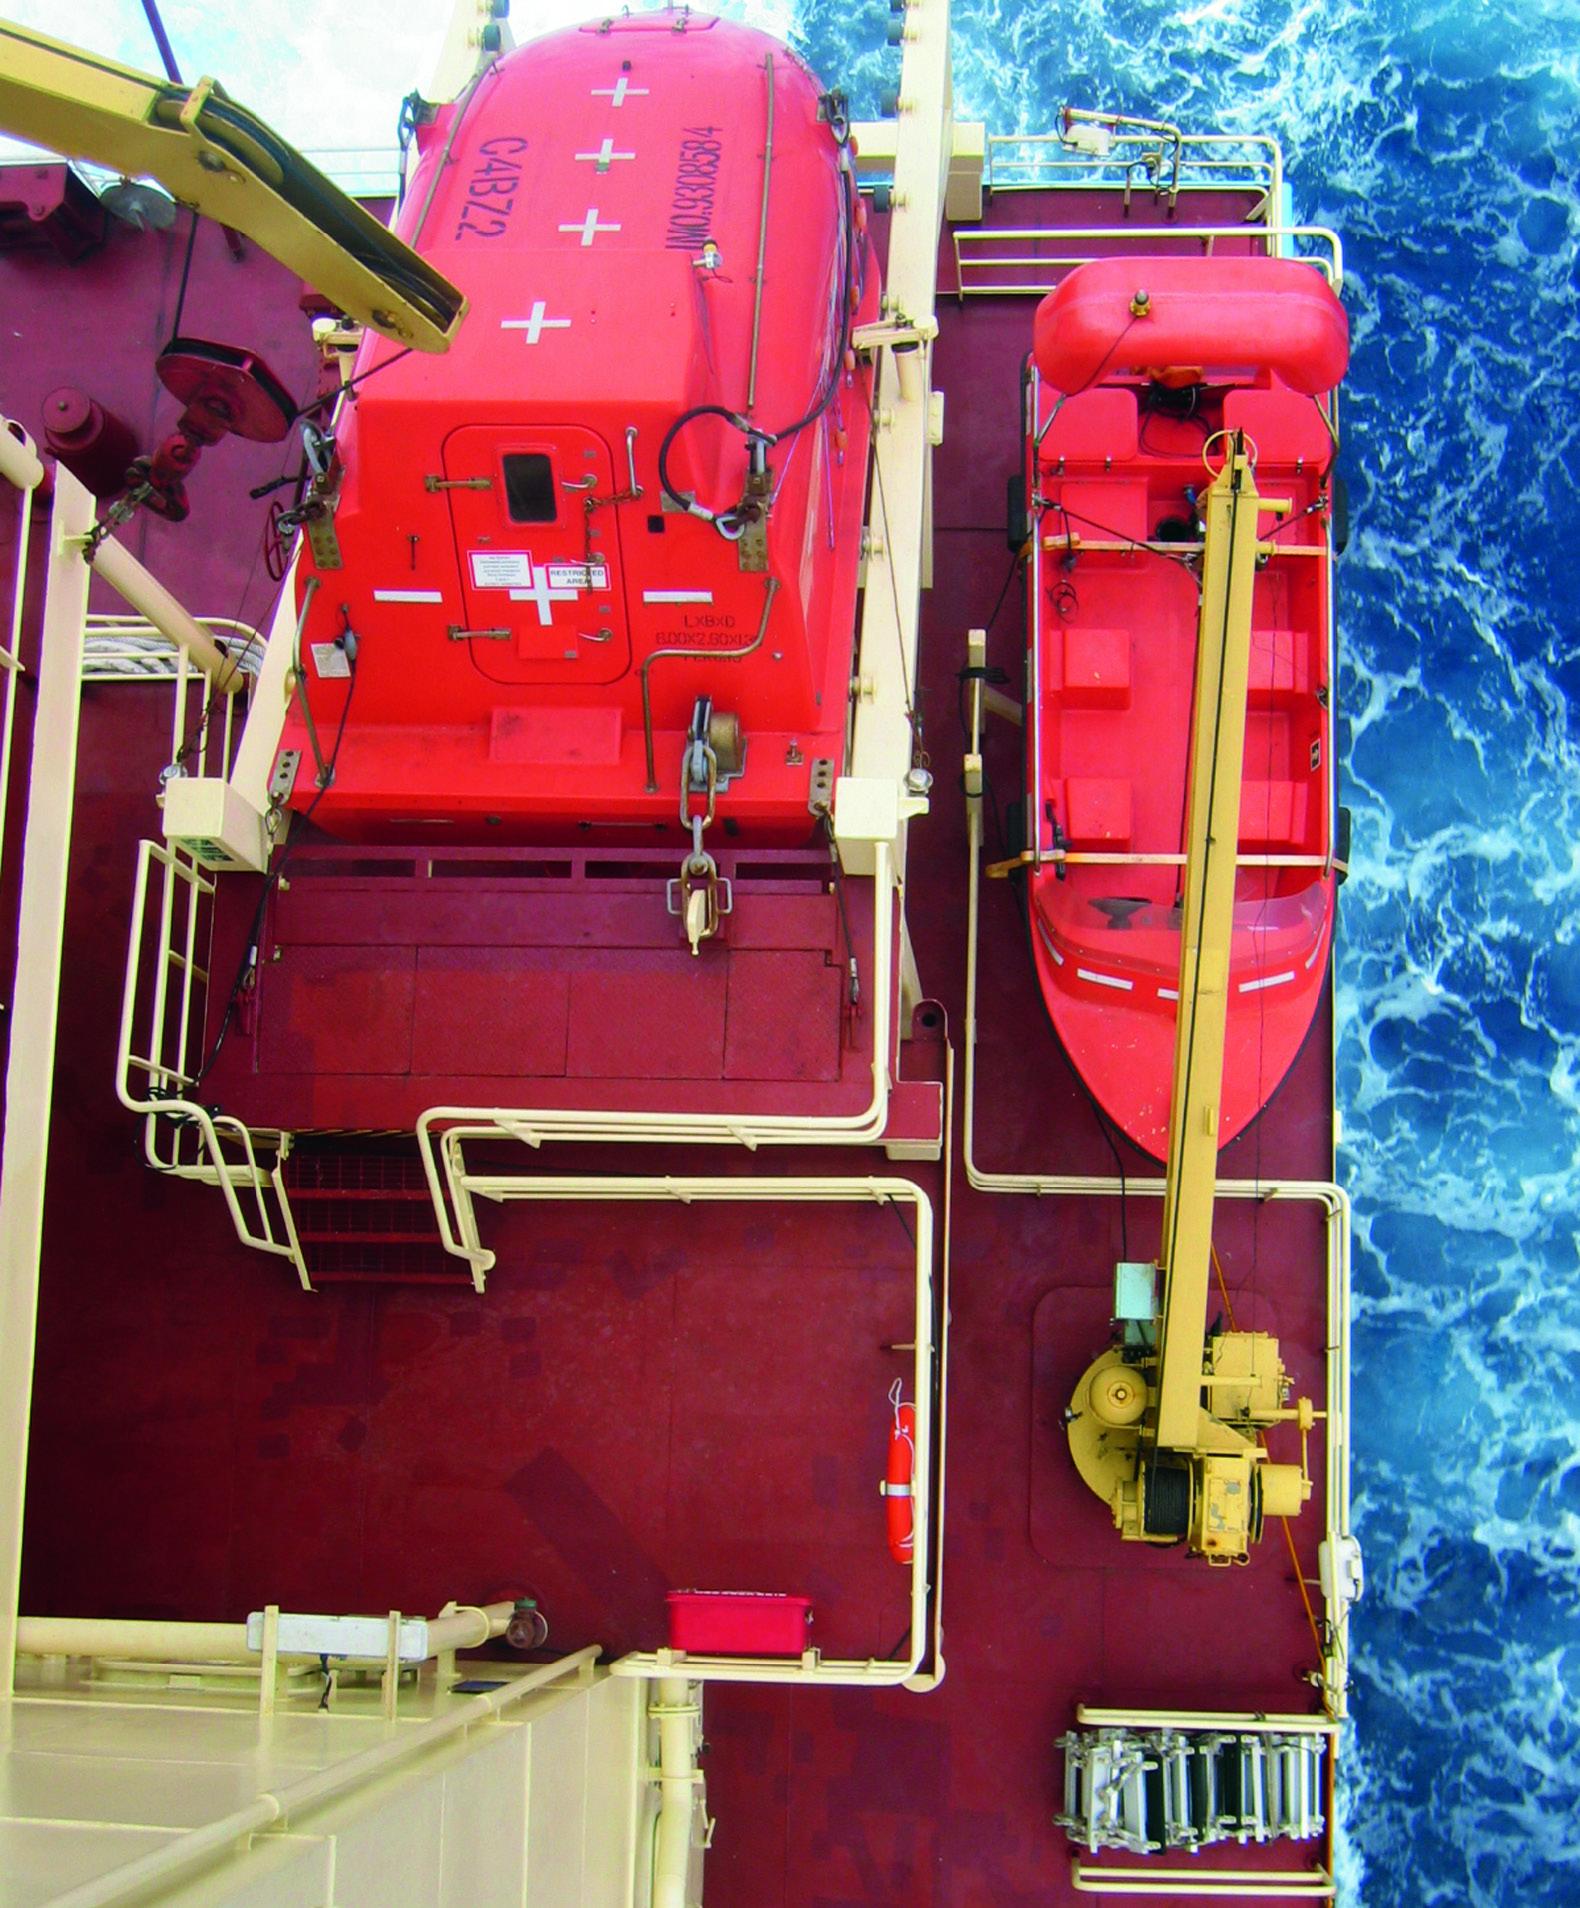 Launching appliance or arrangement